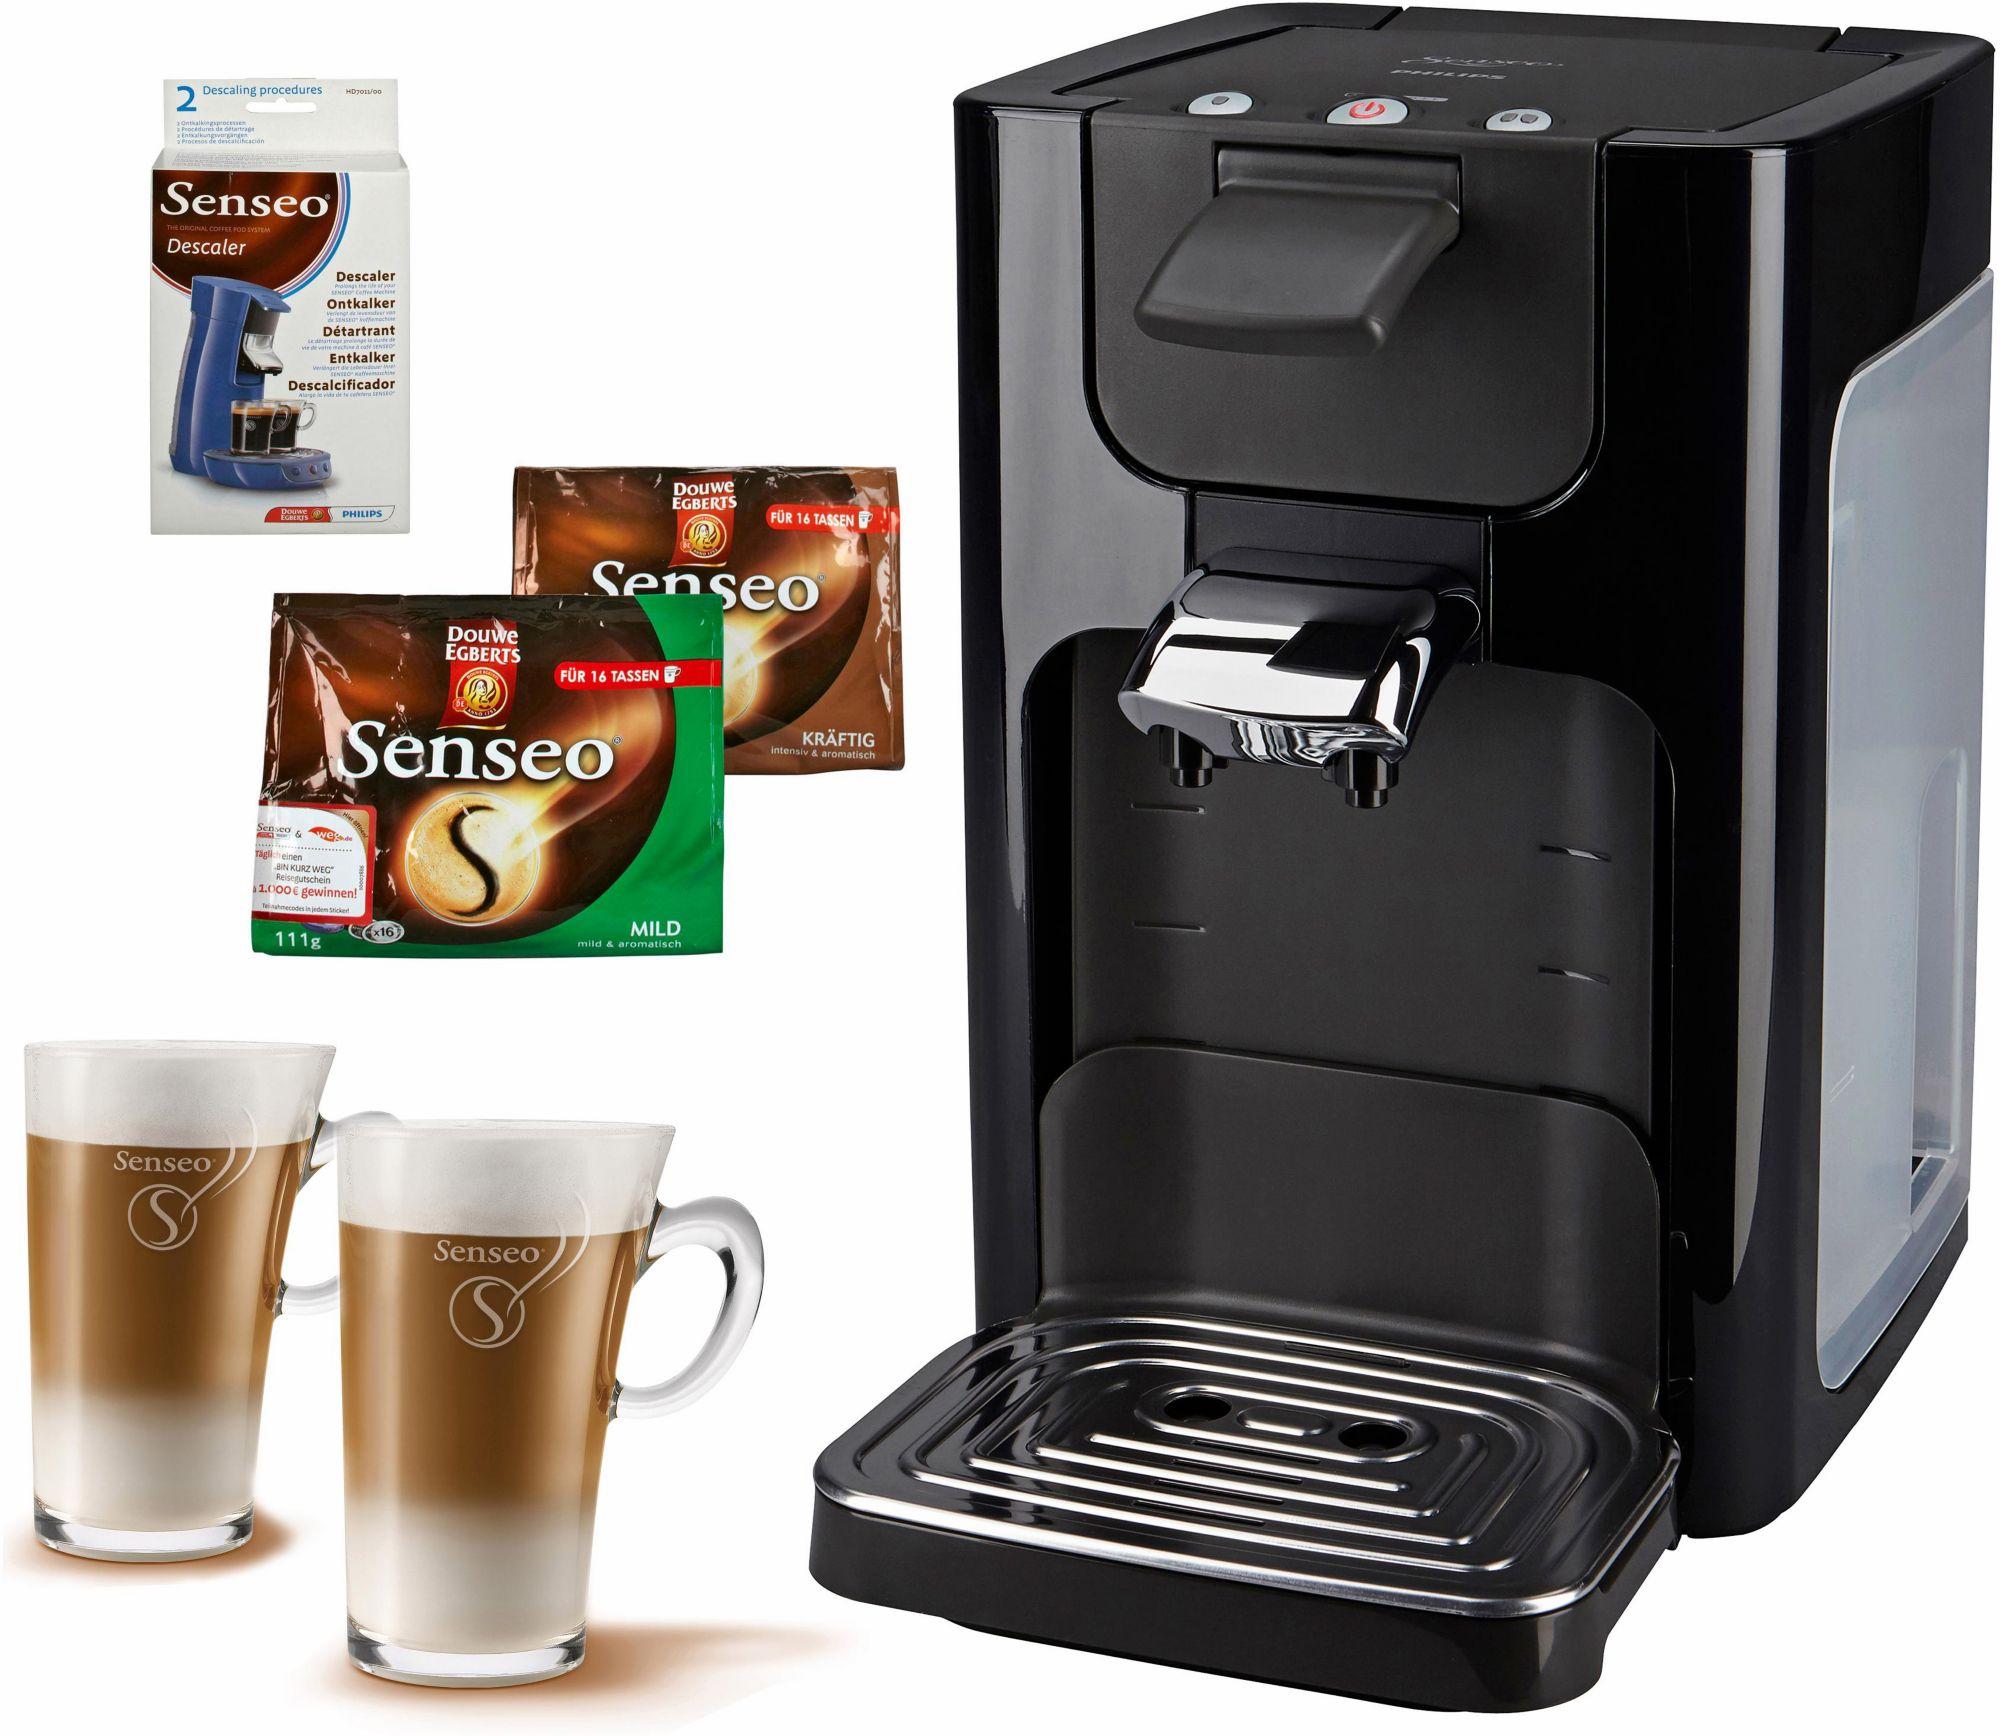 philips senseo kaffeepadmaschine hd7863 quadrante inkl. Black Bedroom Furniture Sets. Home Design Ideas